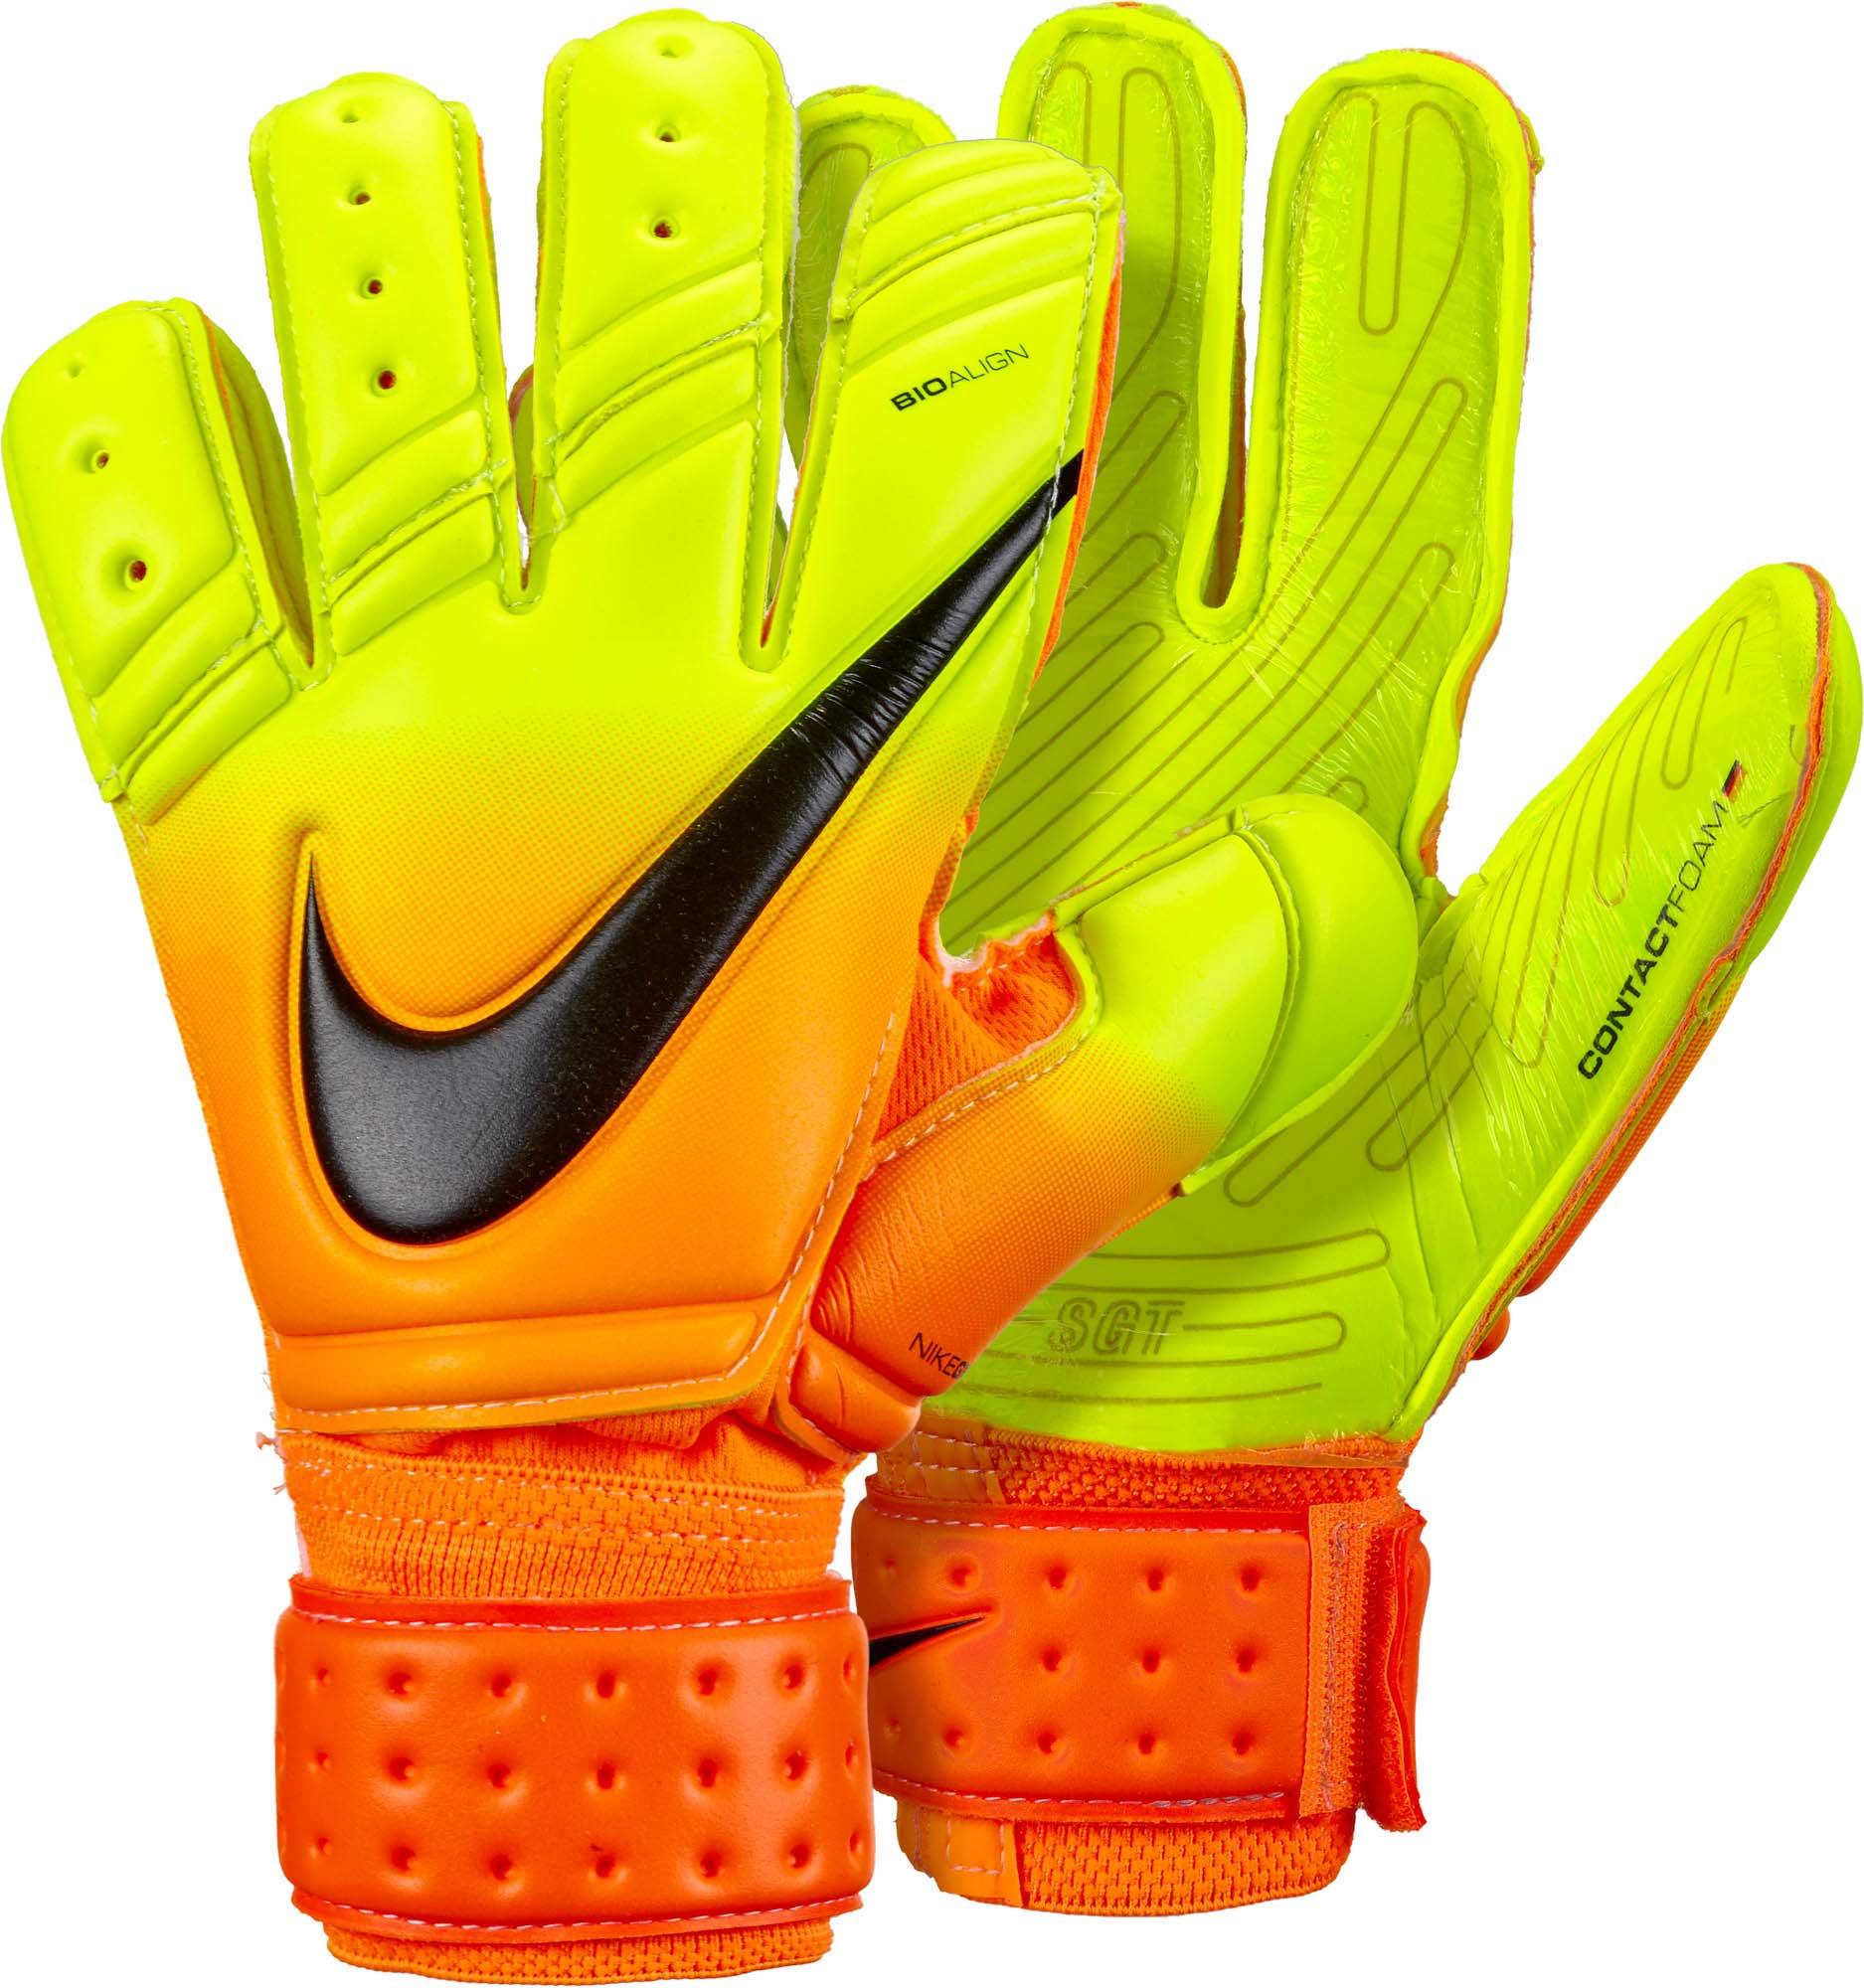 Nike Premier SGT Goalkeeper Gloves - Bright Citrus Volt - Soccer ... d6d512ec2b2e